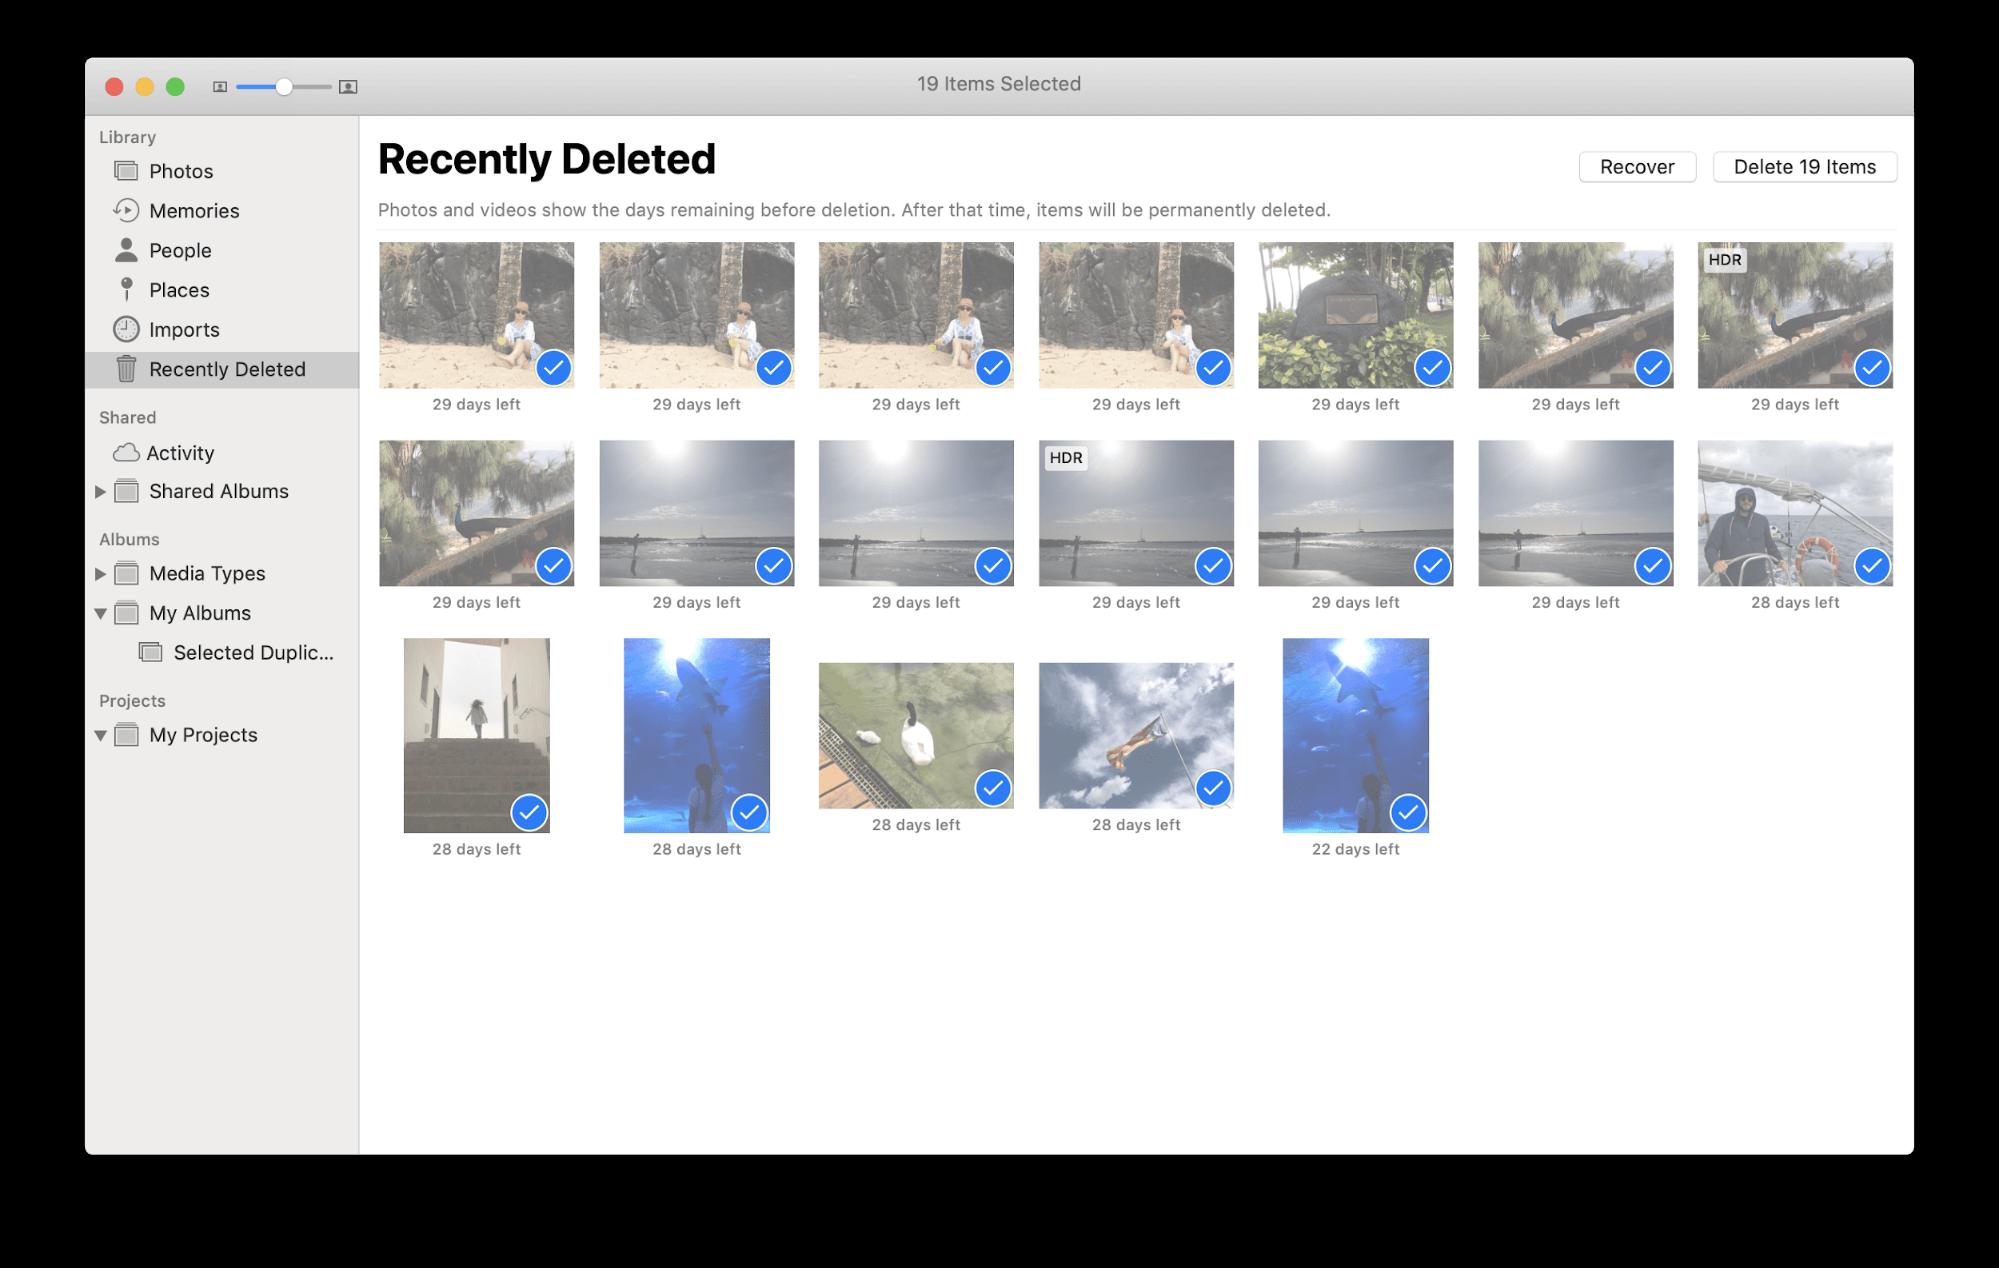 find similar images on hard drive